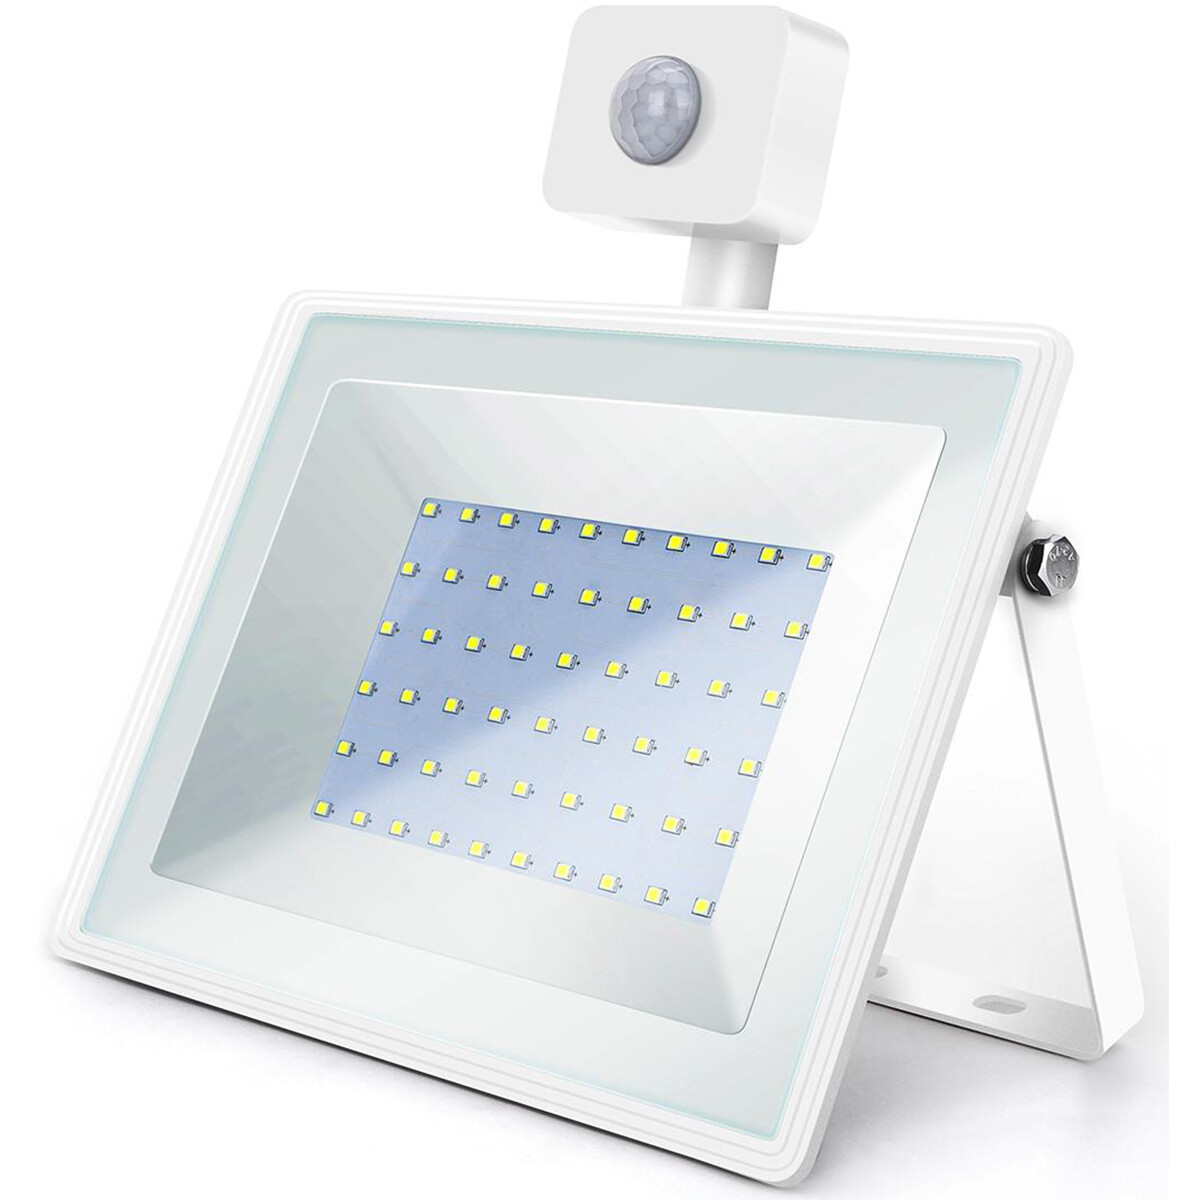 LED Bouwlamp 50 Watt met Sensor - LED Schijnwerper - Aigi Sunny - Helder/Koud Wit 6400K - Waterdicht